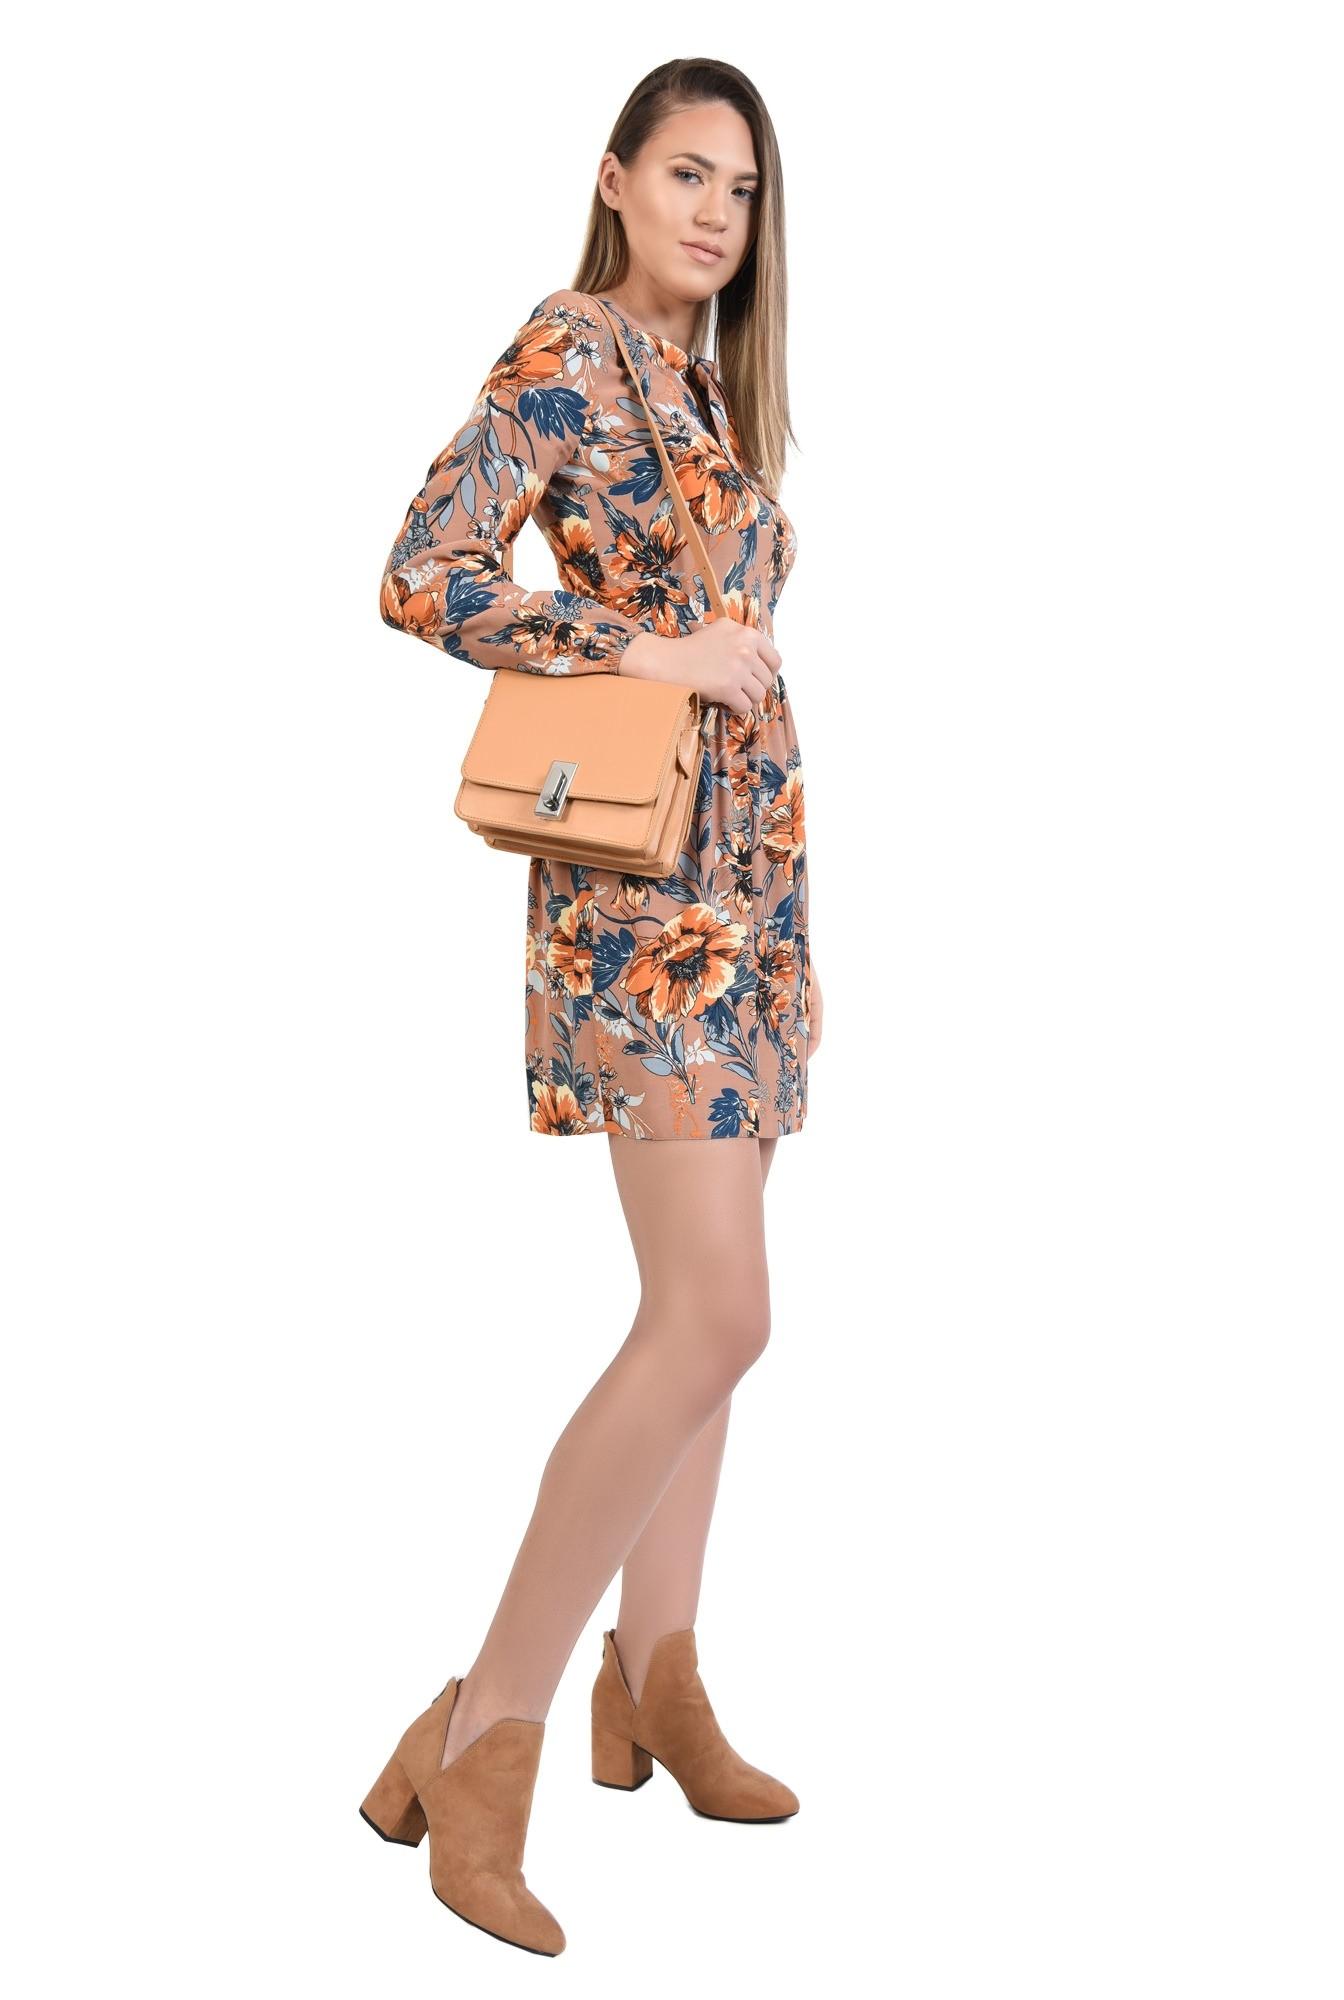 0 - rochie casual, de primavara, din vascoza, cu imprimeu floral